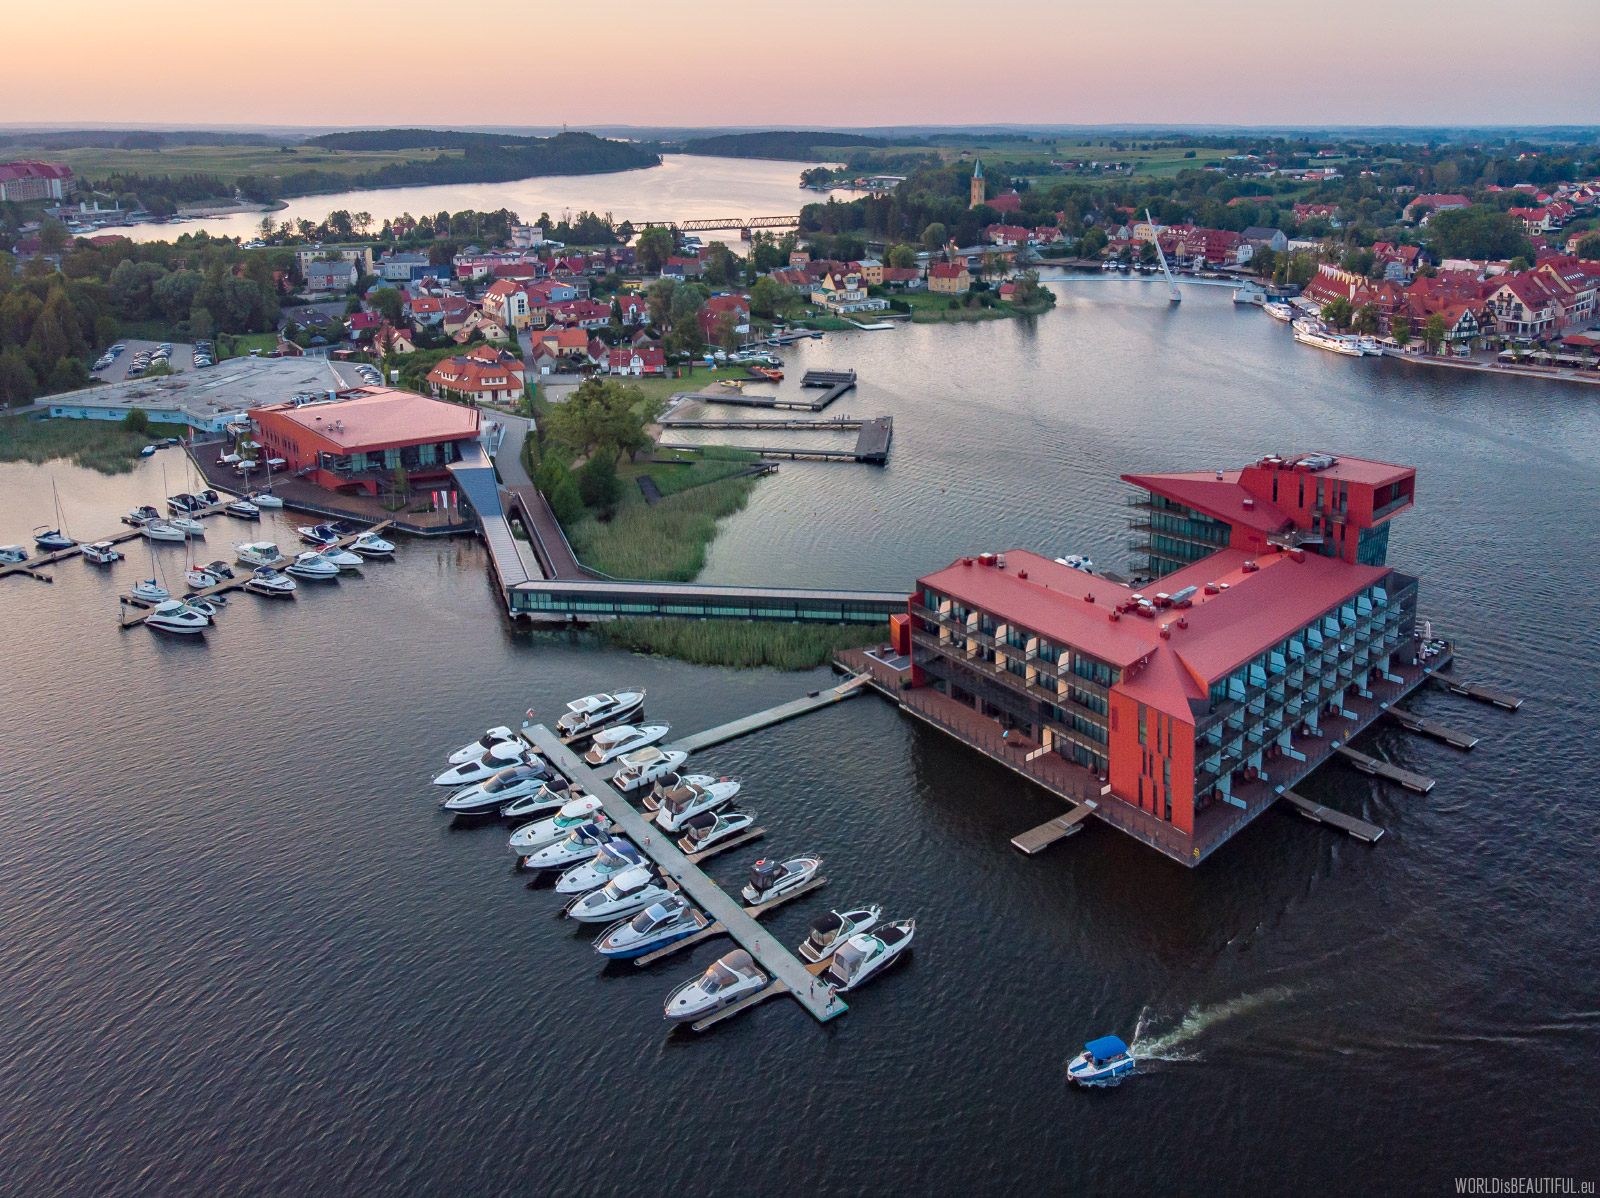 5-star Hotel Mikolajki